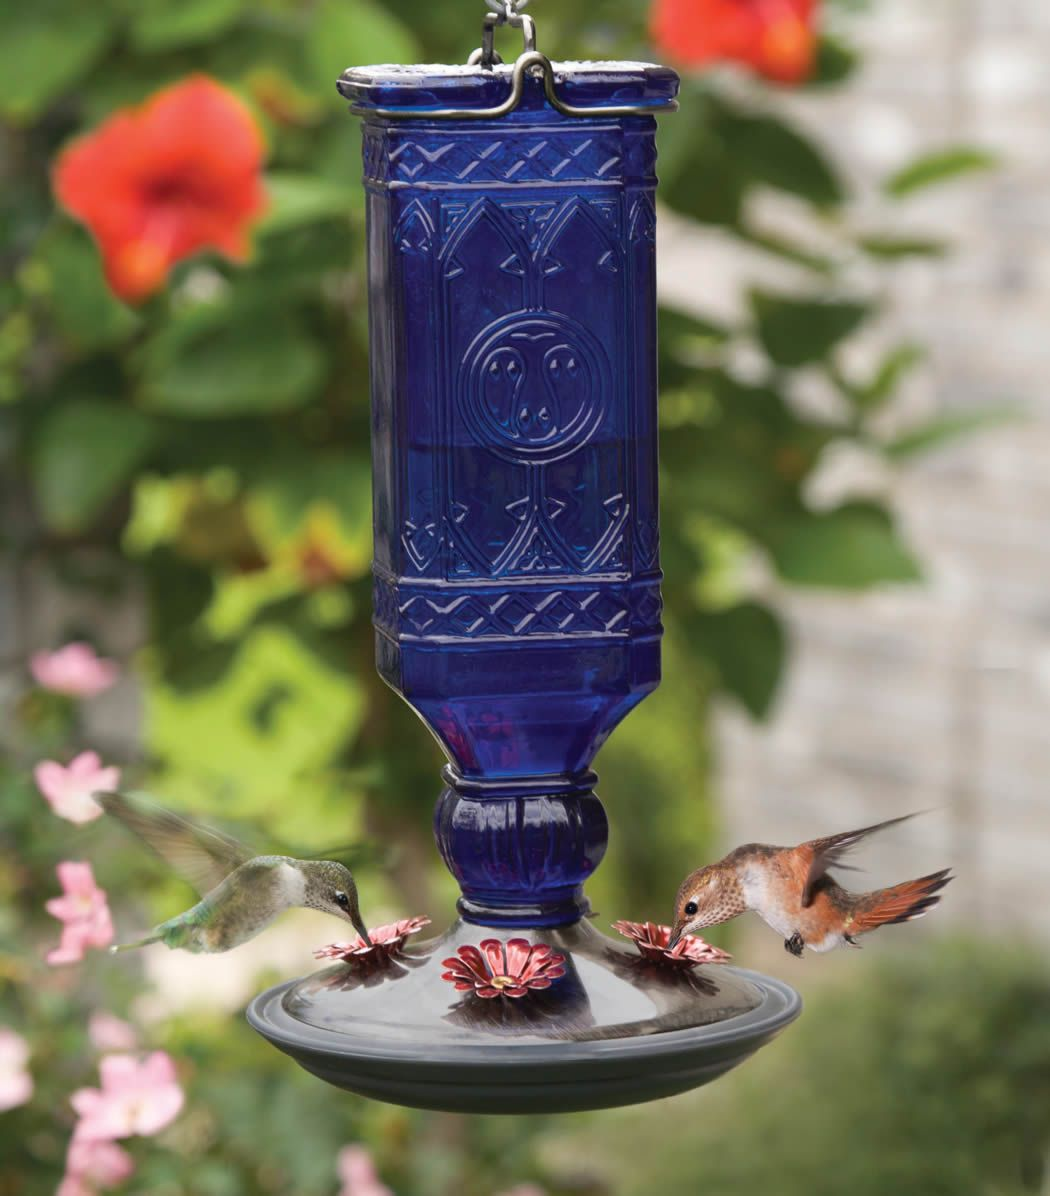 Cobalt Antique Bottle Feeder Humming bird feeders